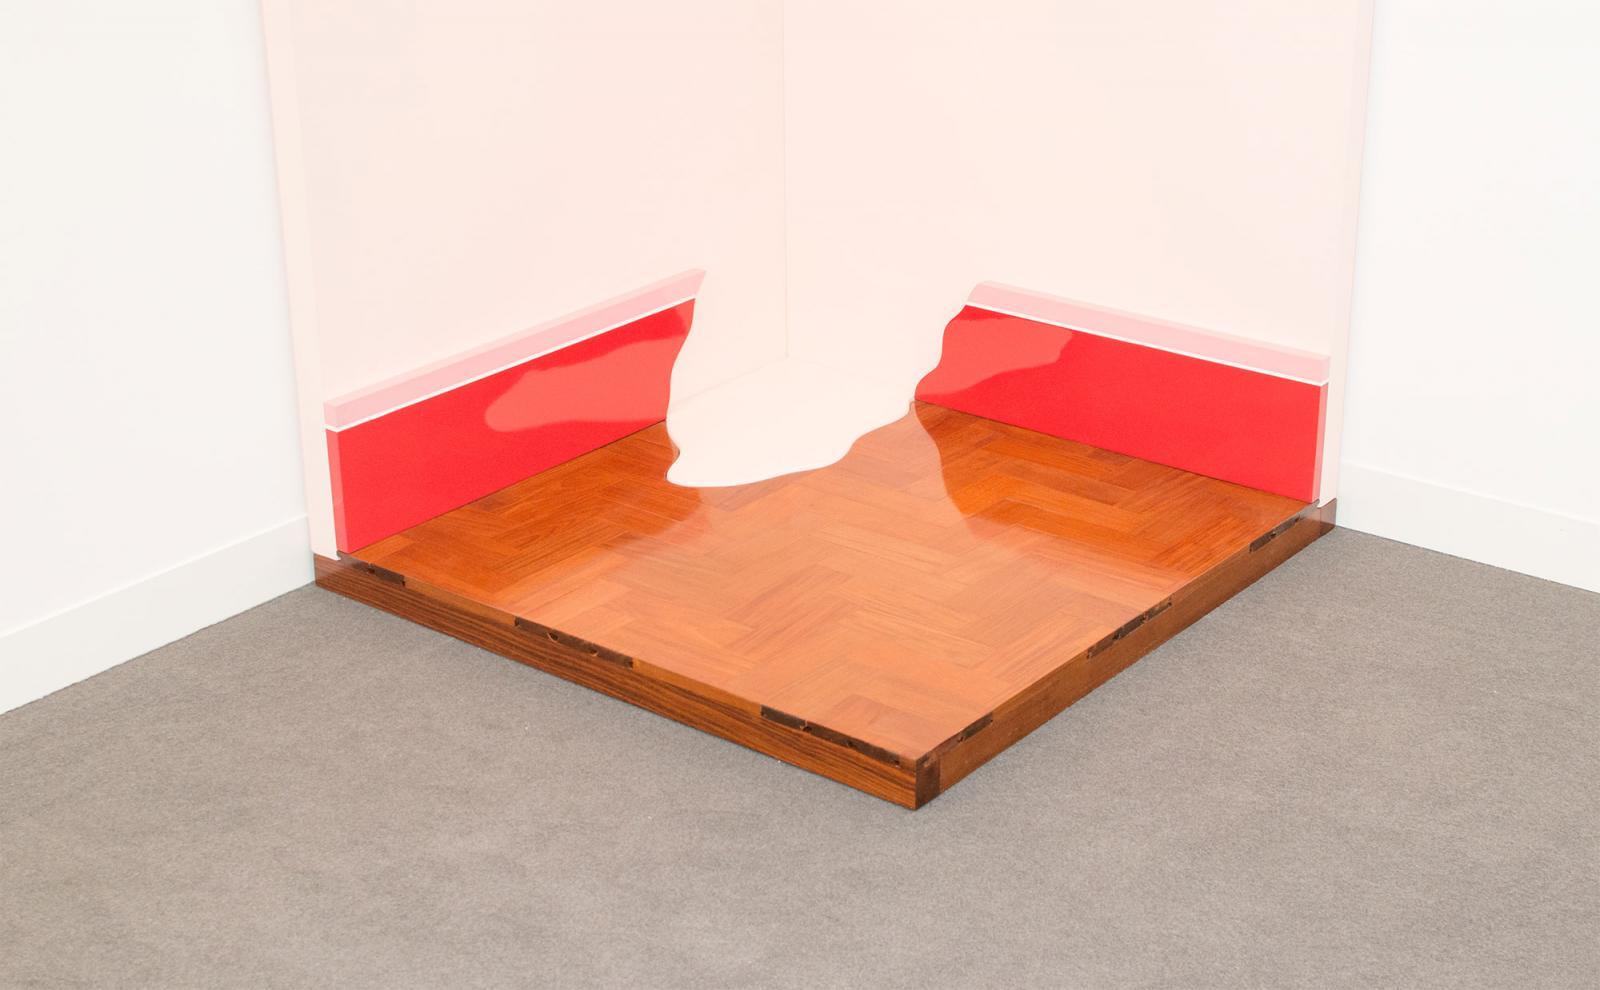 Cildo Meireles at Galeria Luisa Strina